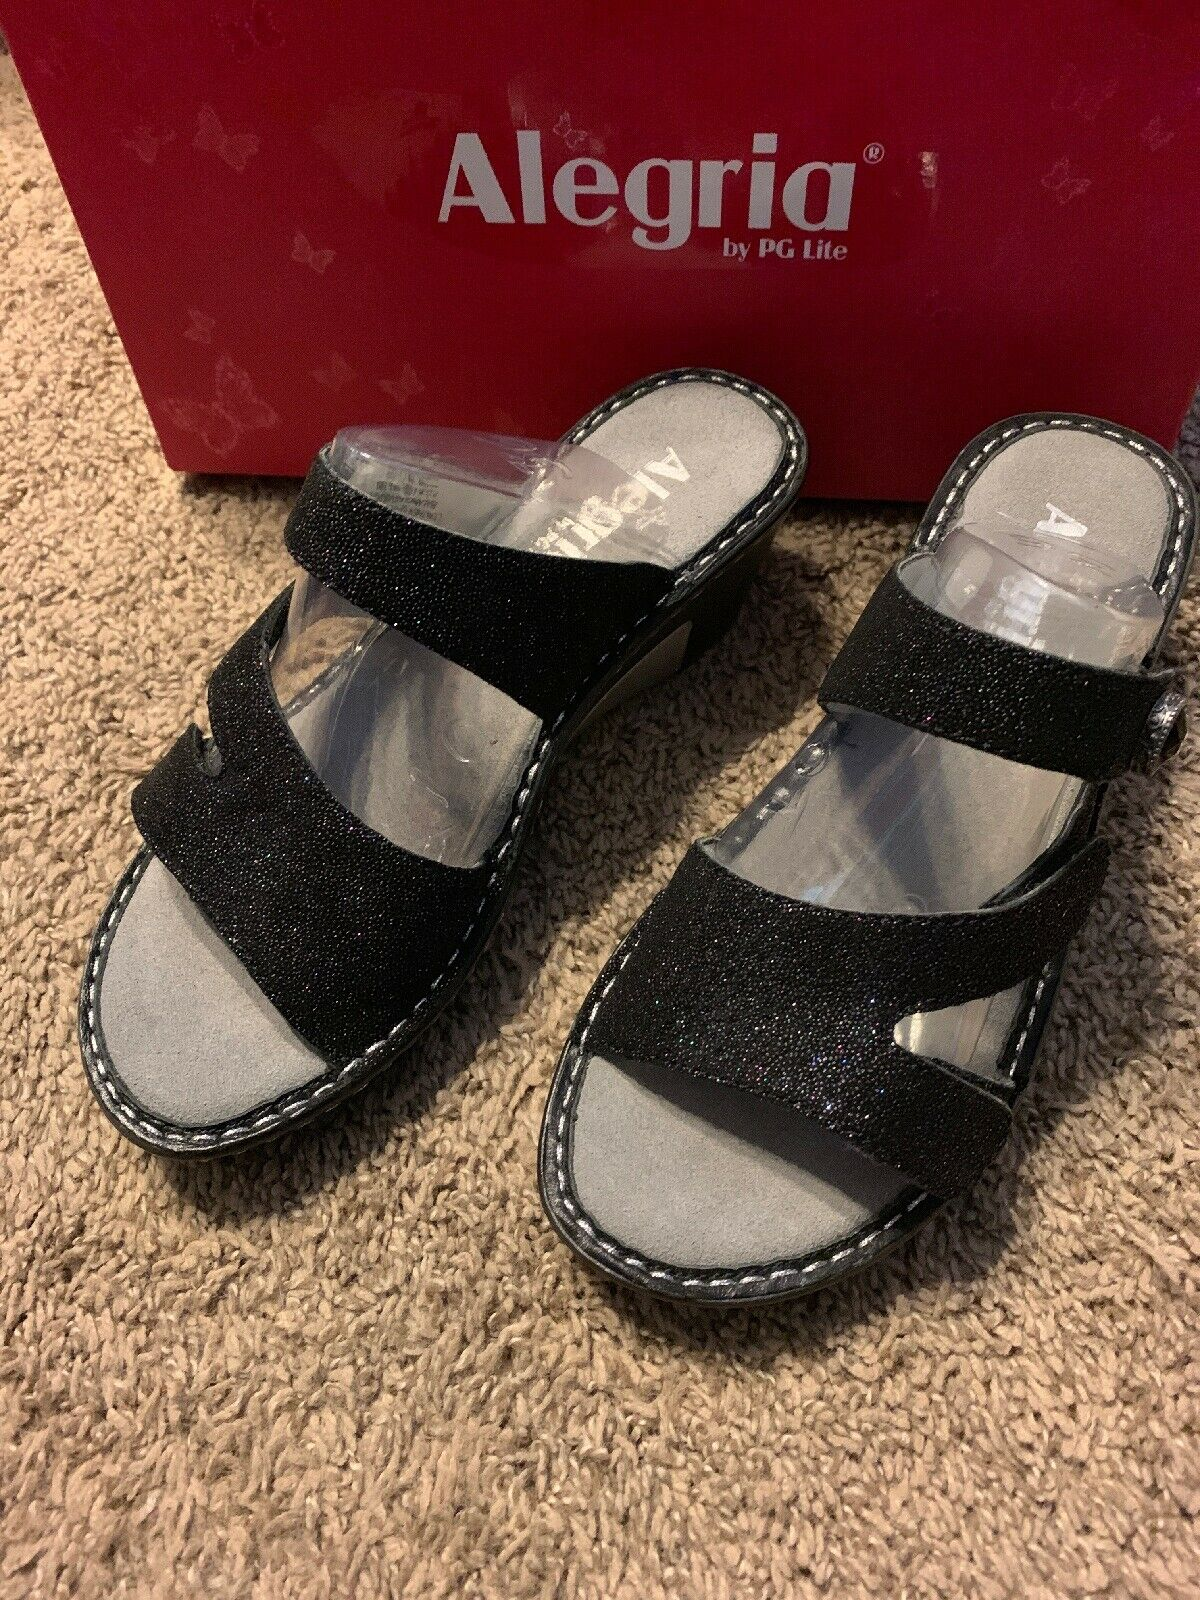 Alegria Loti Glitteredi Black Shimmer Leather Sandals Sz.36 Sz6-6.5 New Lot-699